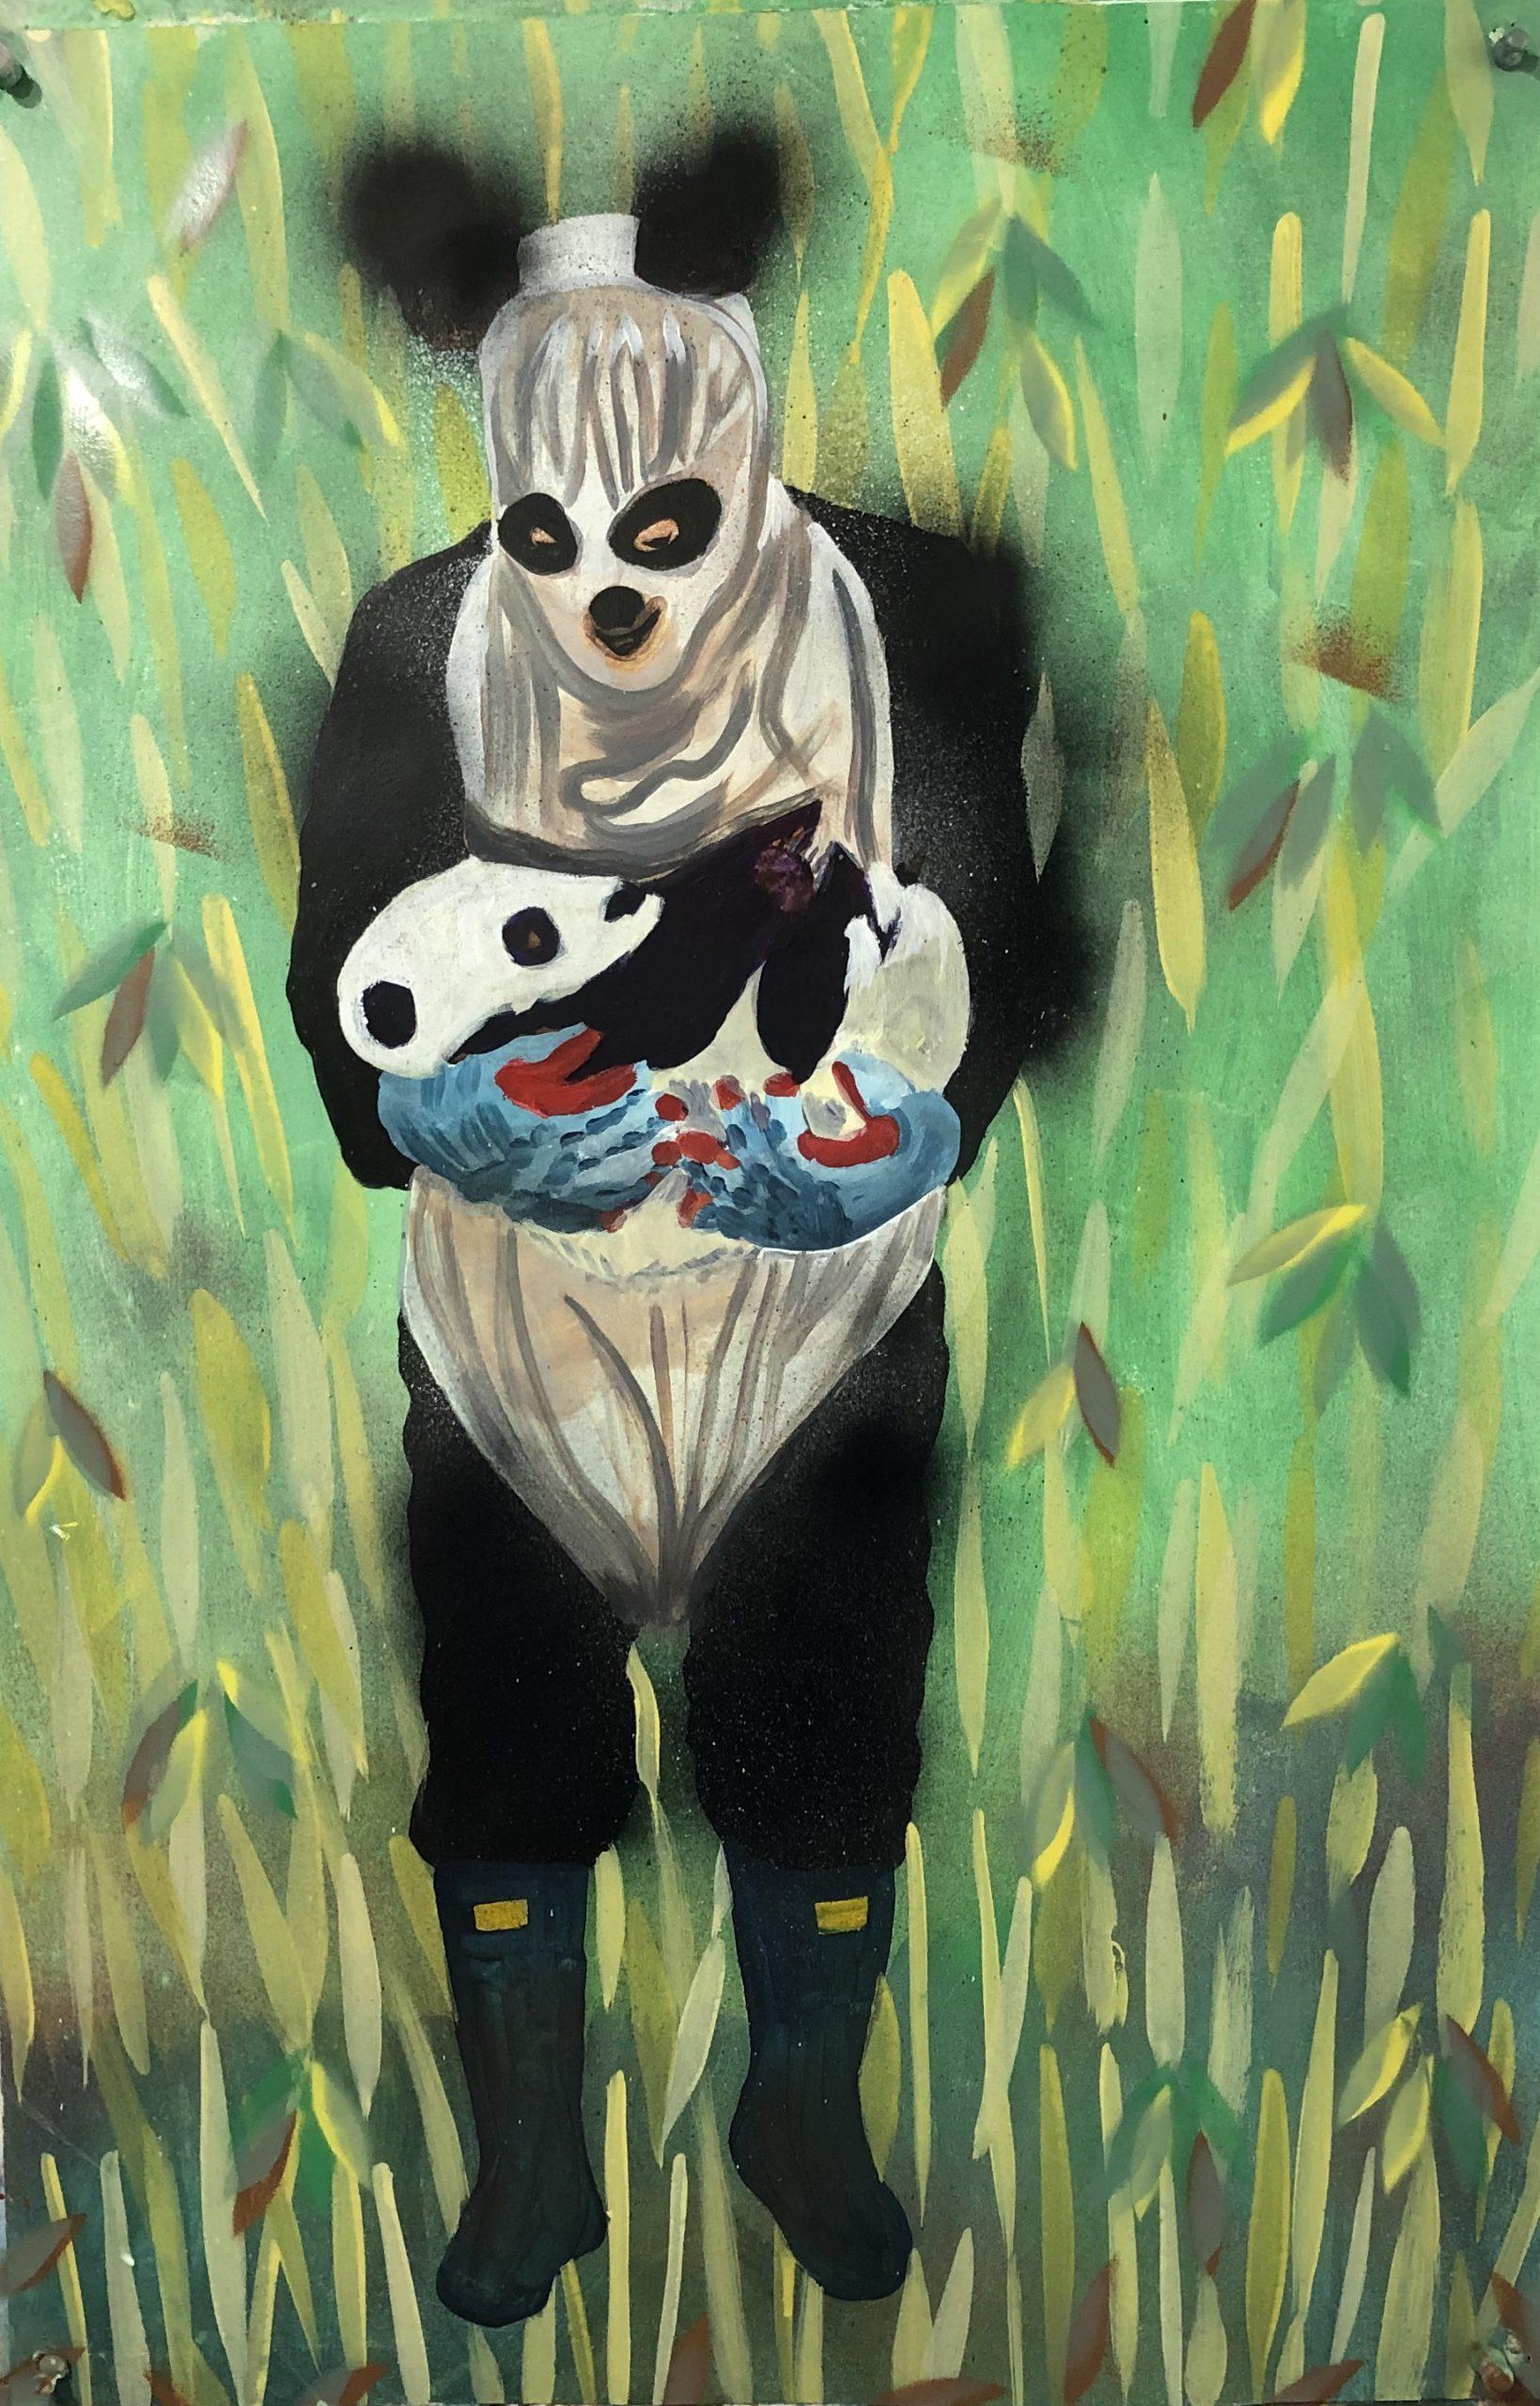 paternal-panda-experiment-2019-acrylic-on-paper-23.5×36-